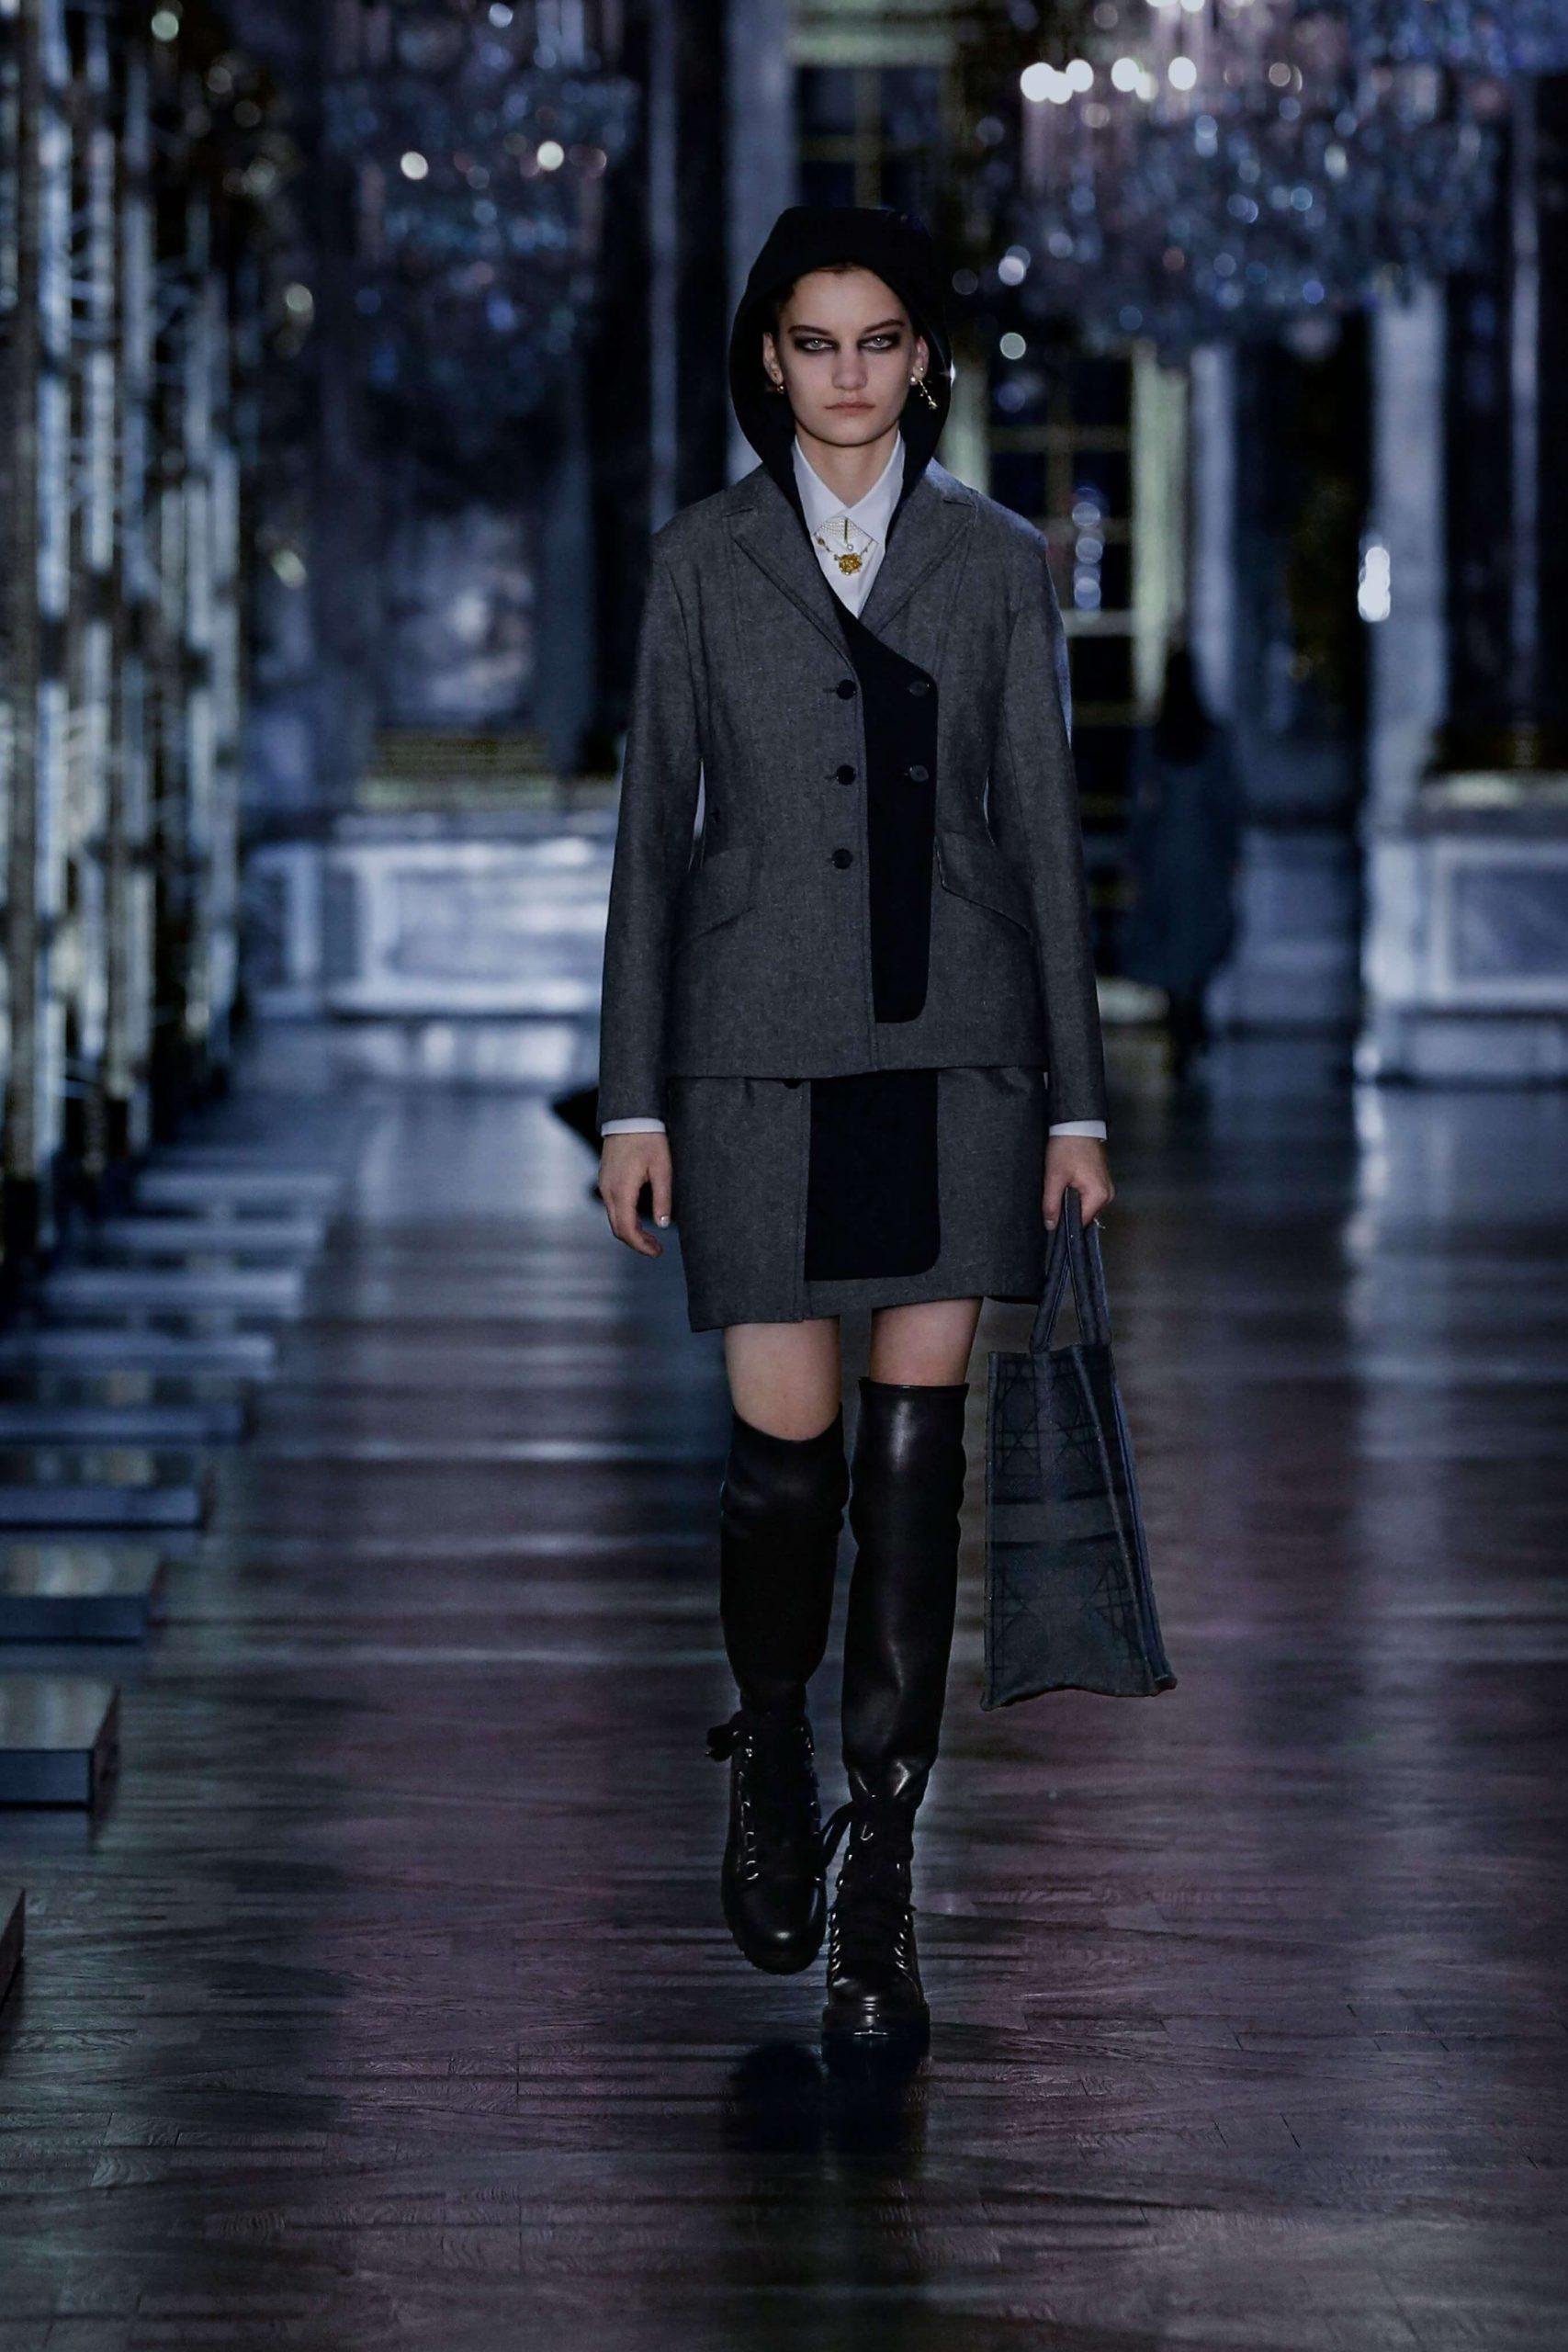 00016 Christian Dior Fall 21